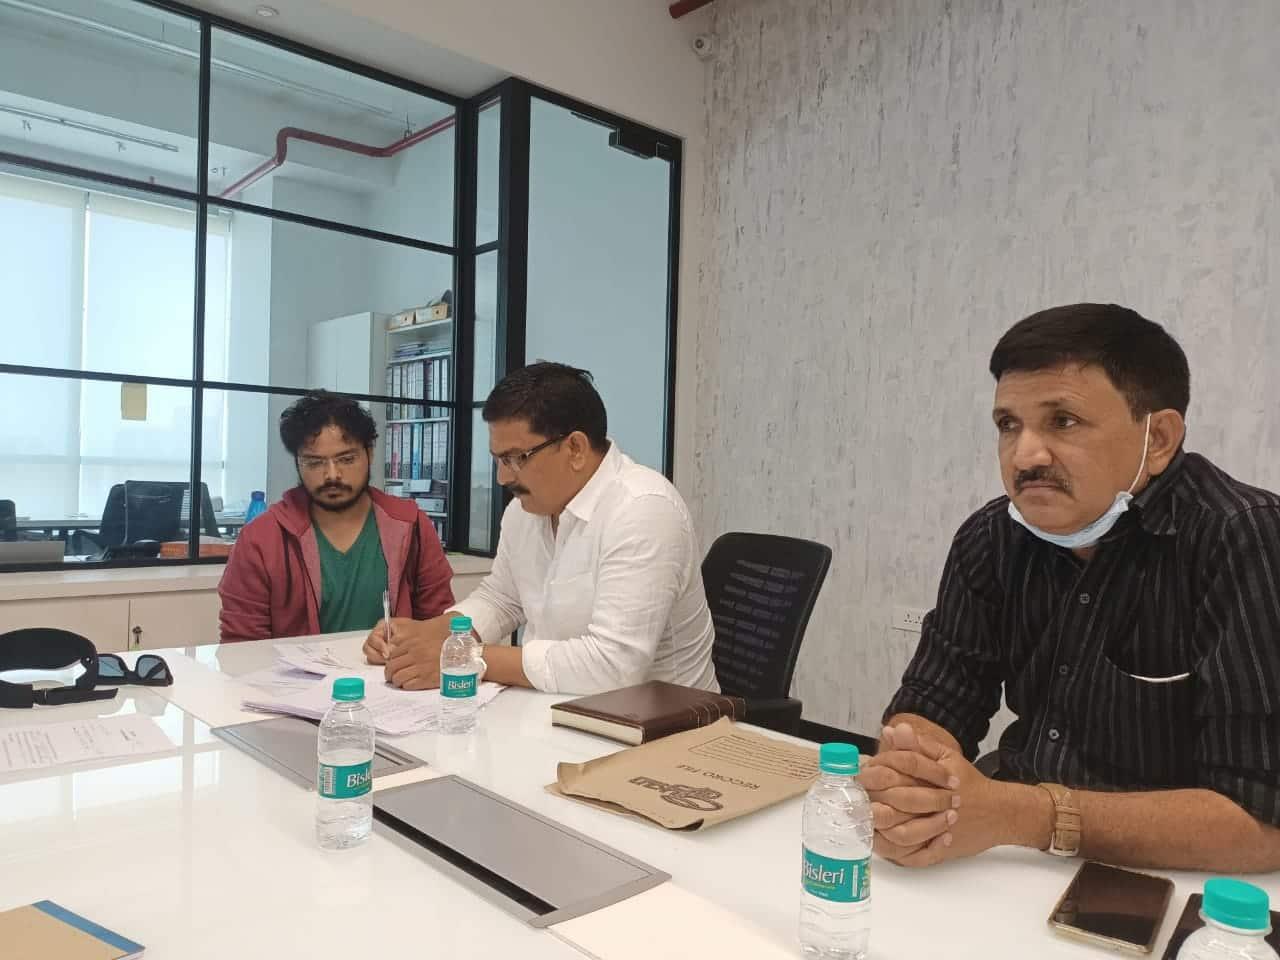 , Tandav row: Director Ali Abbas Zafar, writer Gaurav Solanki, producer Himanshu Mehra record statements with Uttar Pradesh police, Indian & World Live Breaking News Coverage And Updates